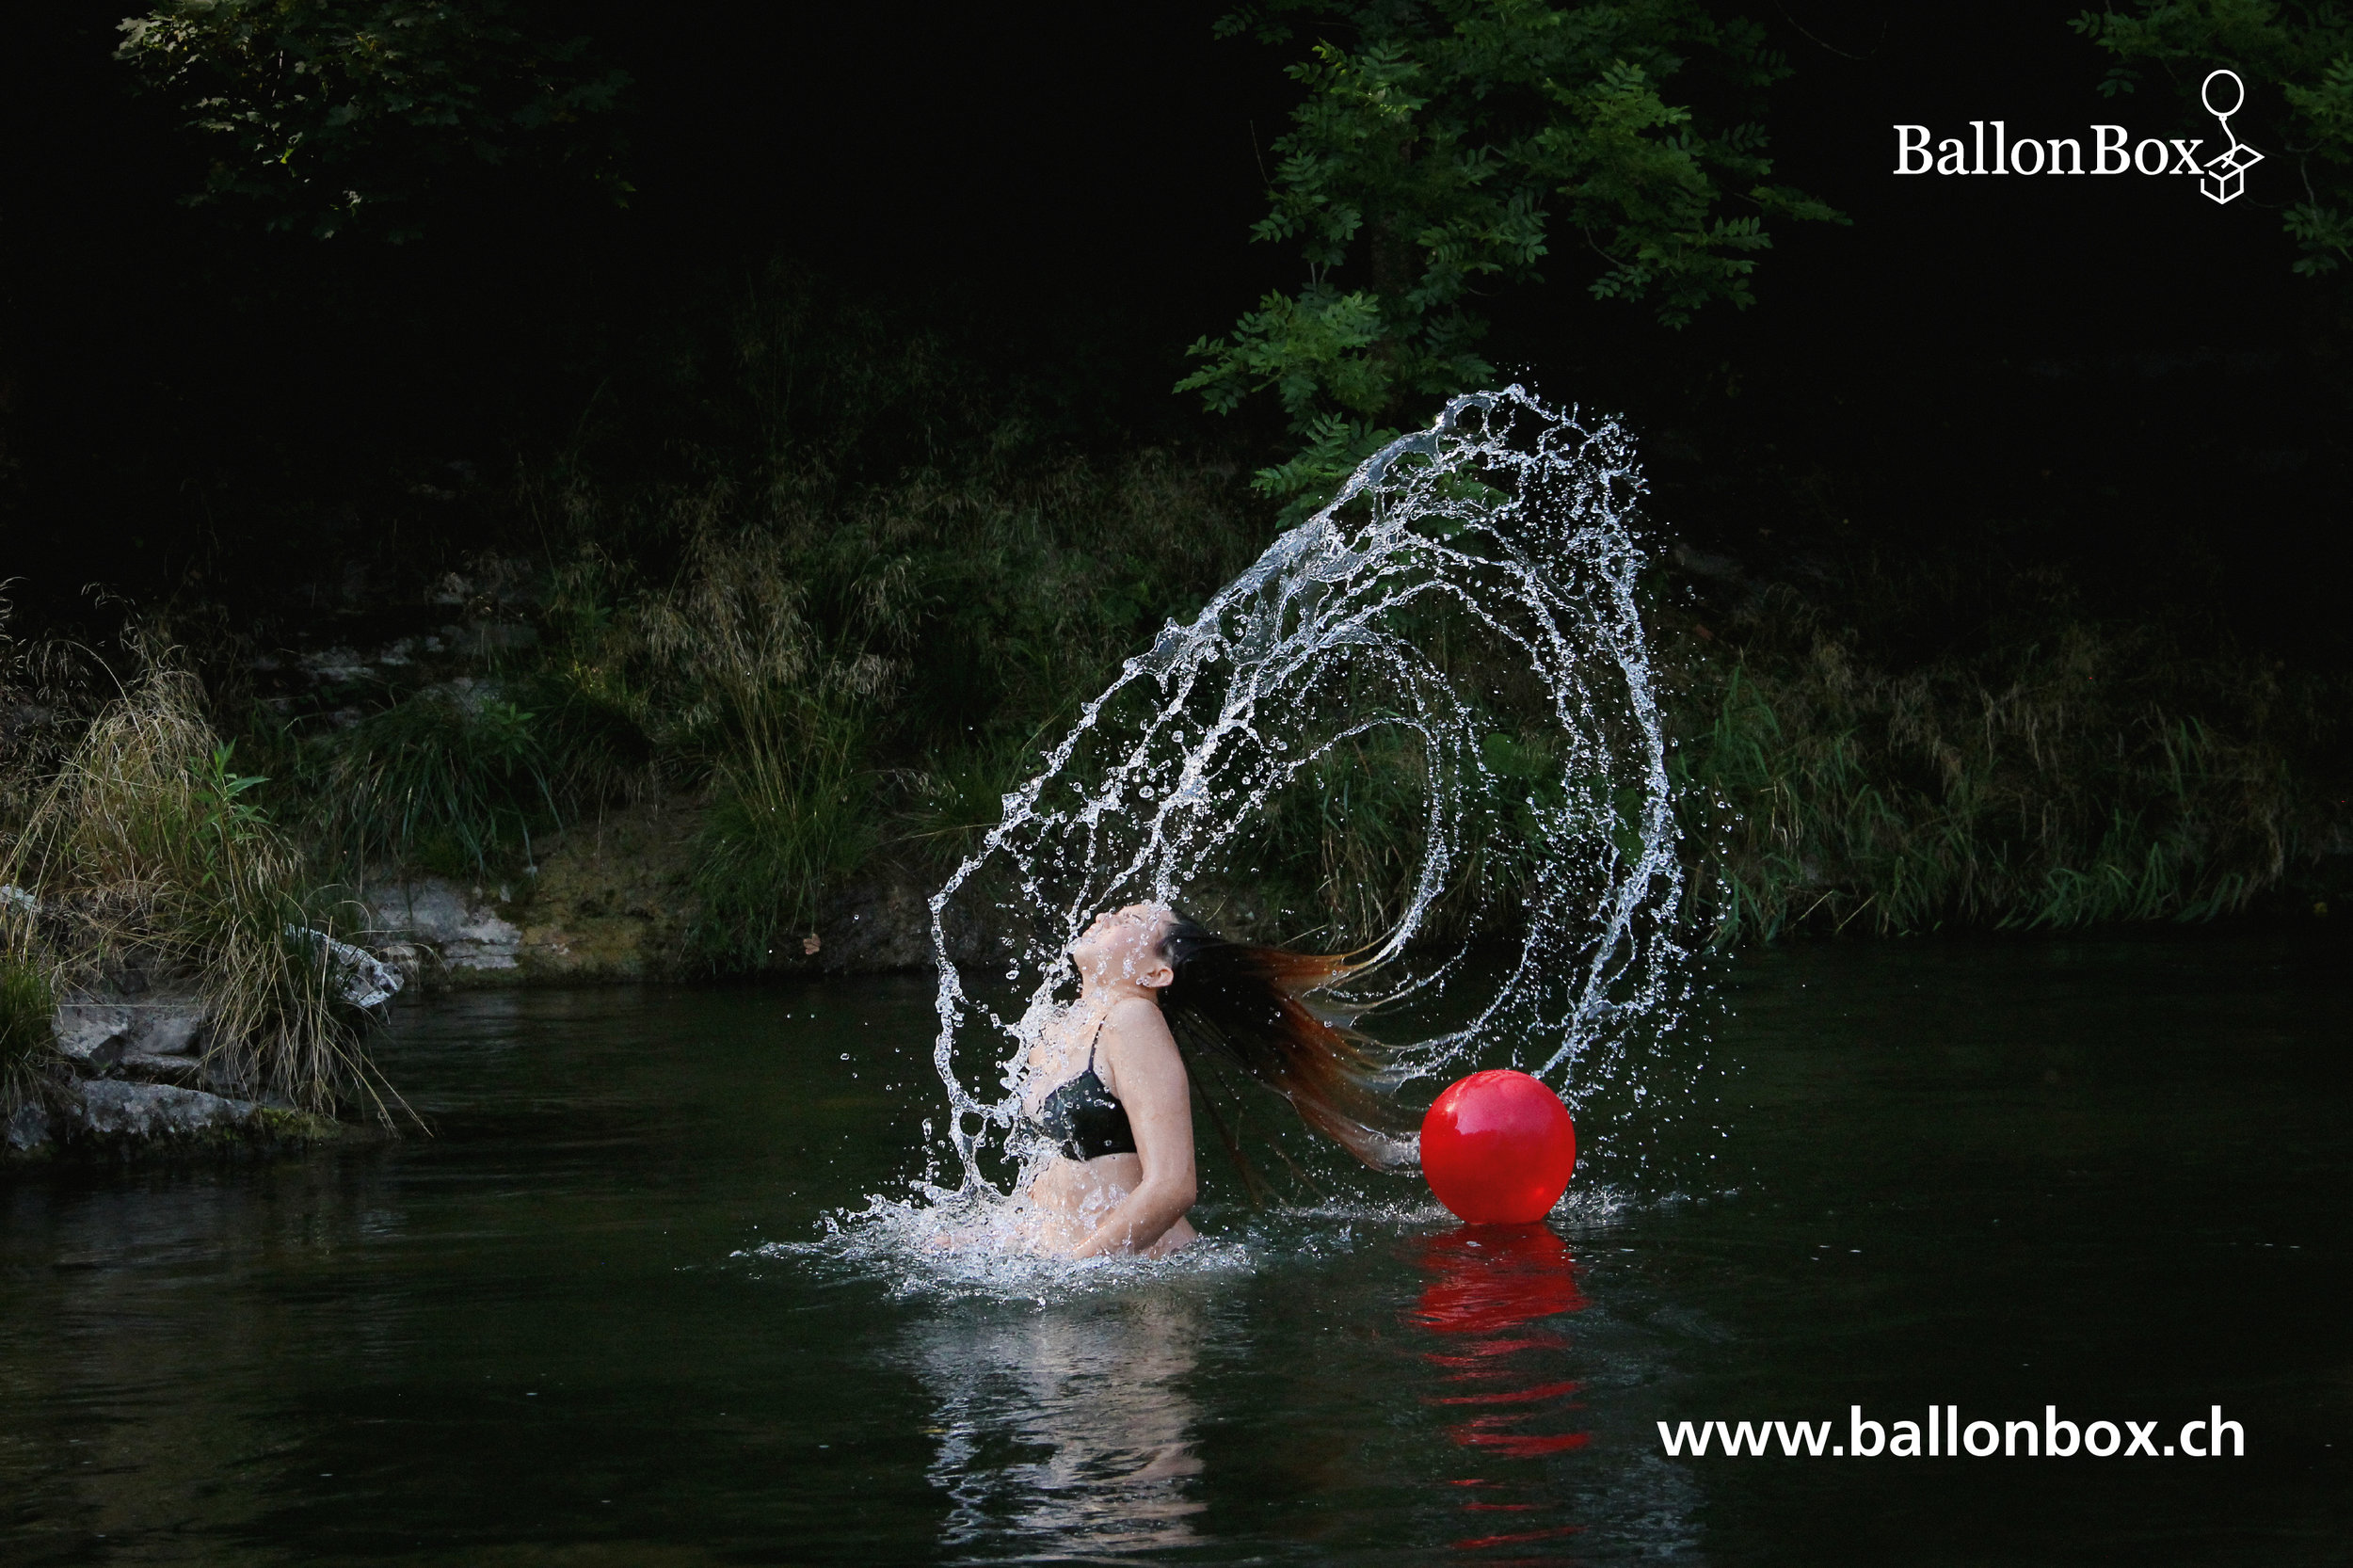 BallonBox_Kalender_19-07.jpg